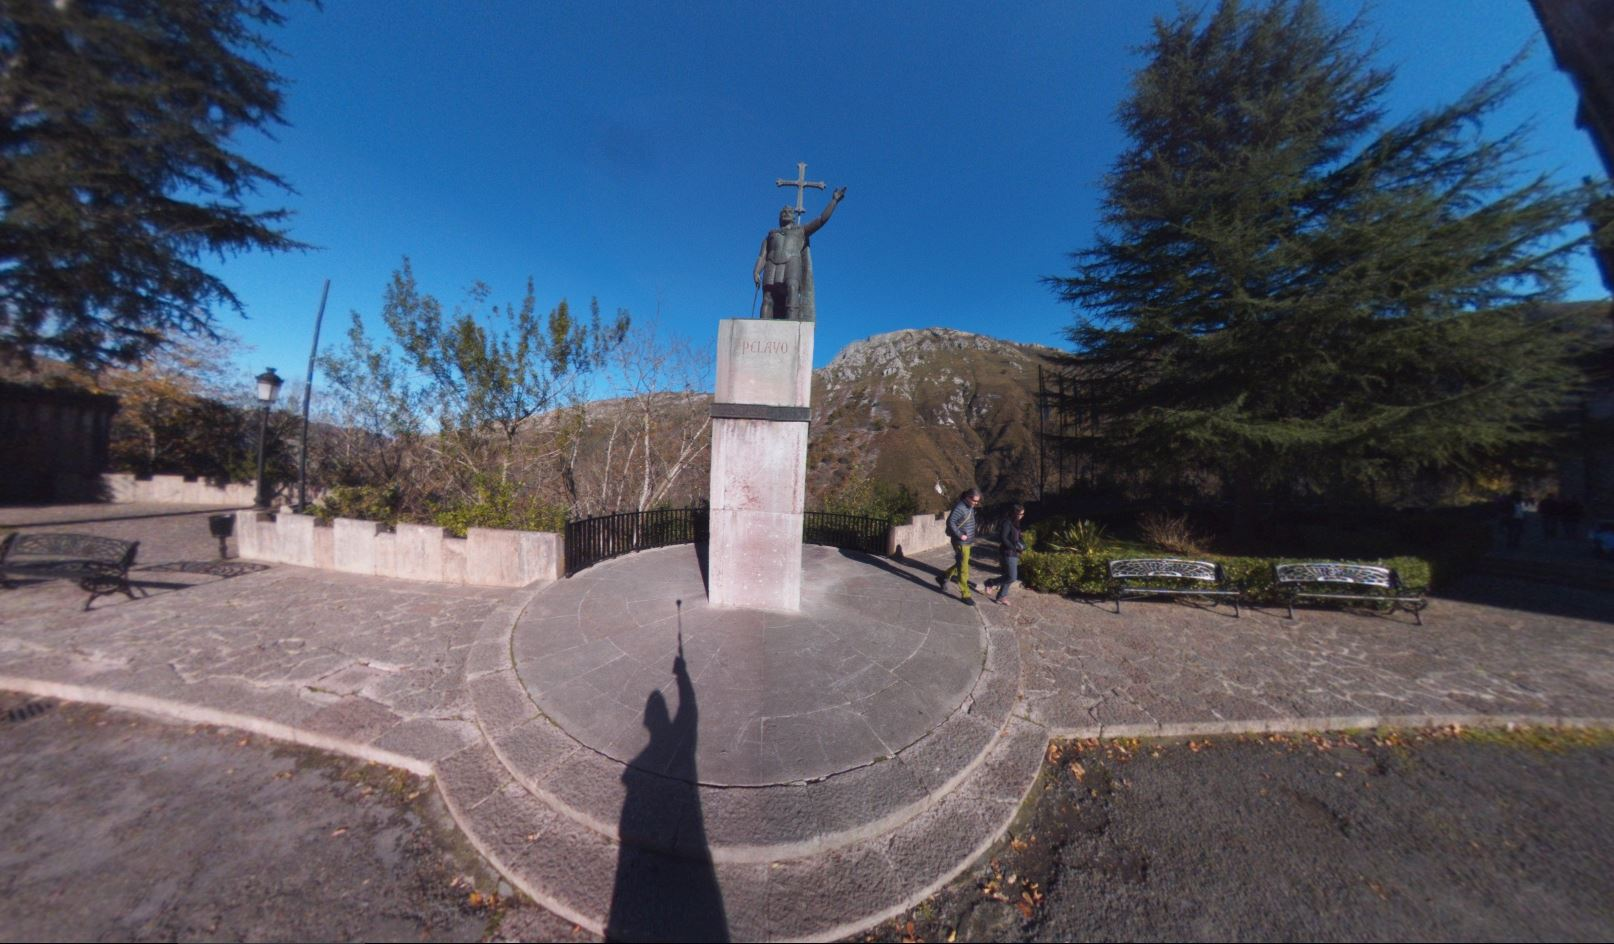 Fotos 360 Estatua de Don Pelayo en Covadonga. #VidePan por #Asturias